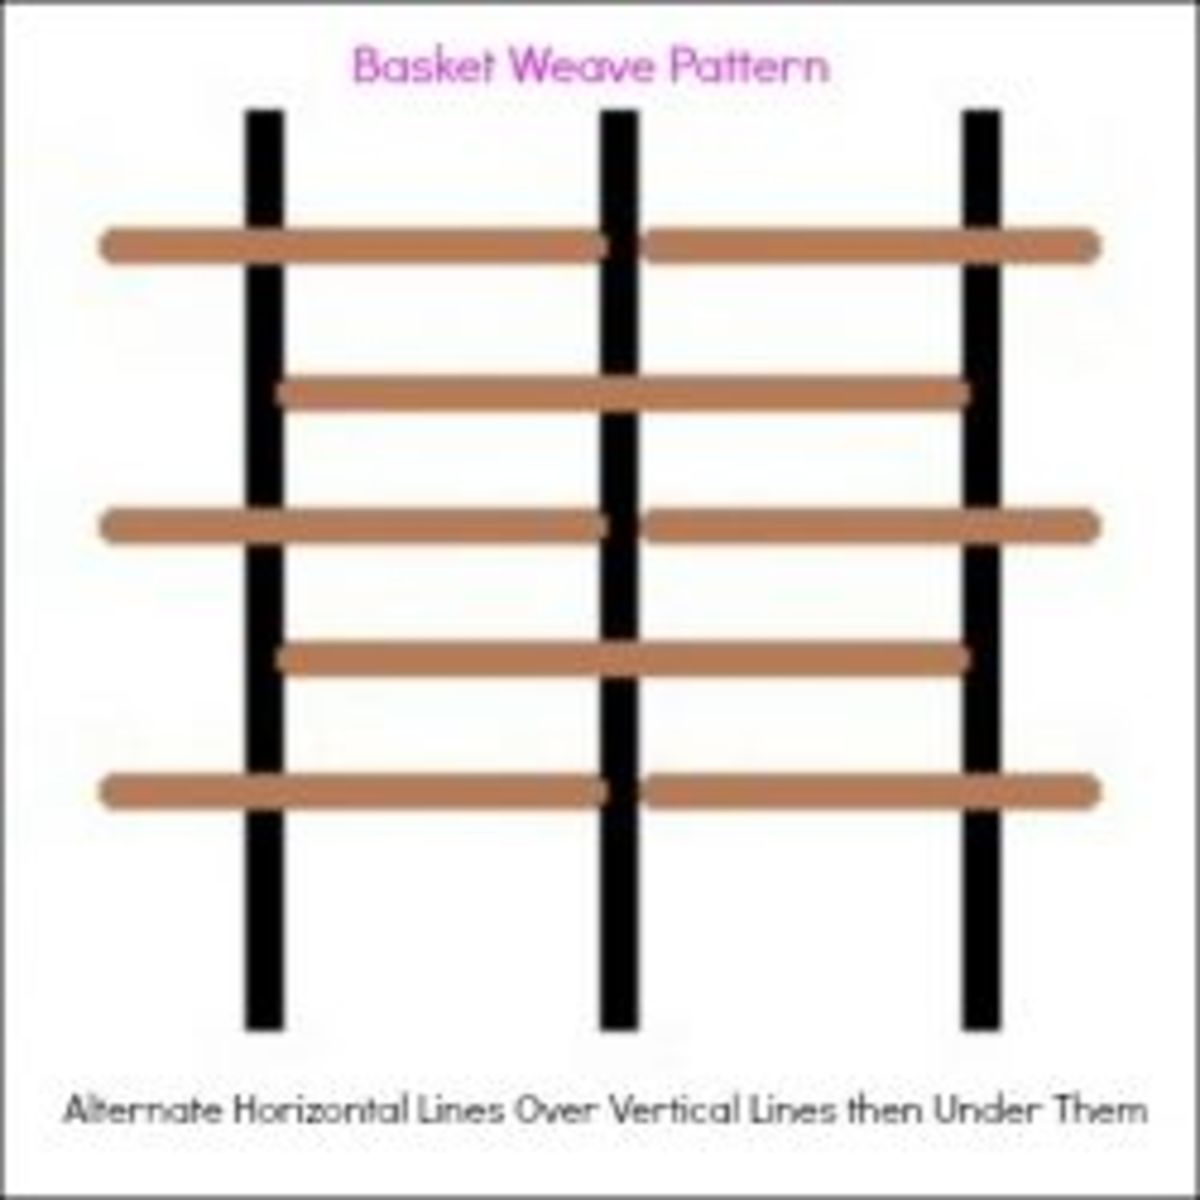 basket weave texture design - Image M Burgess